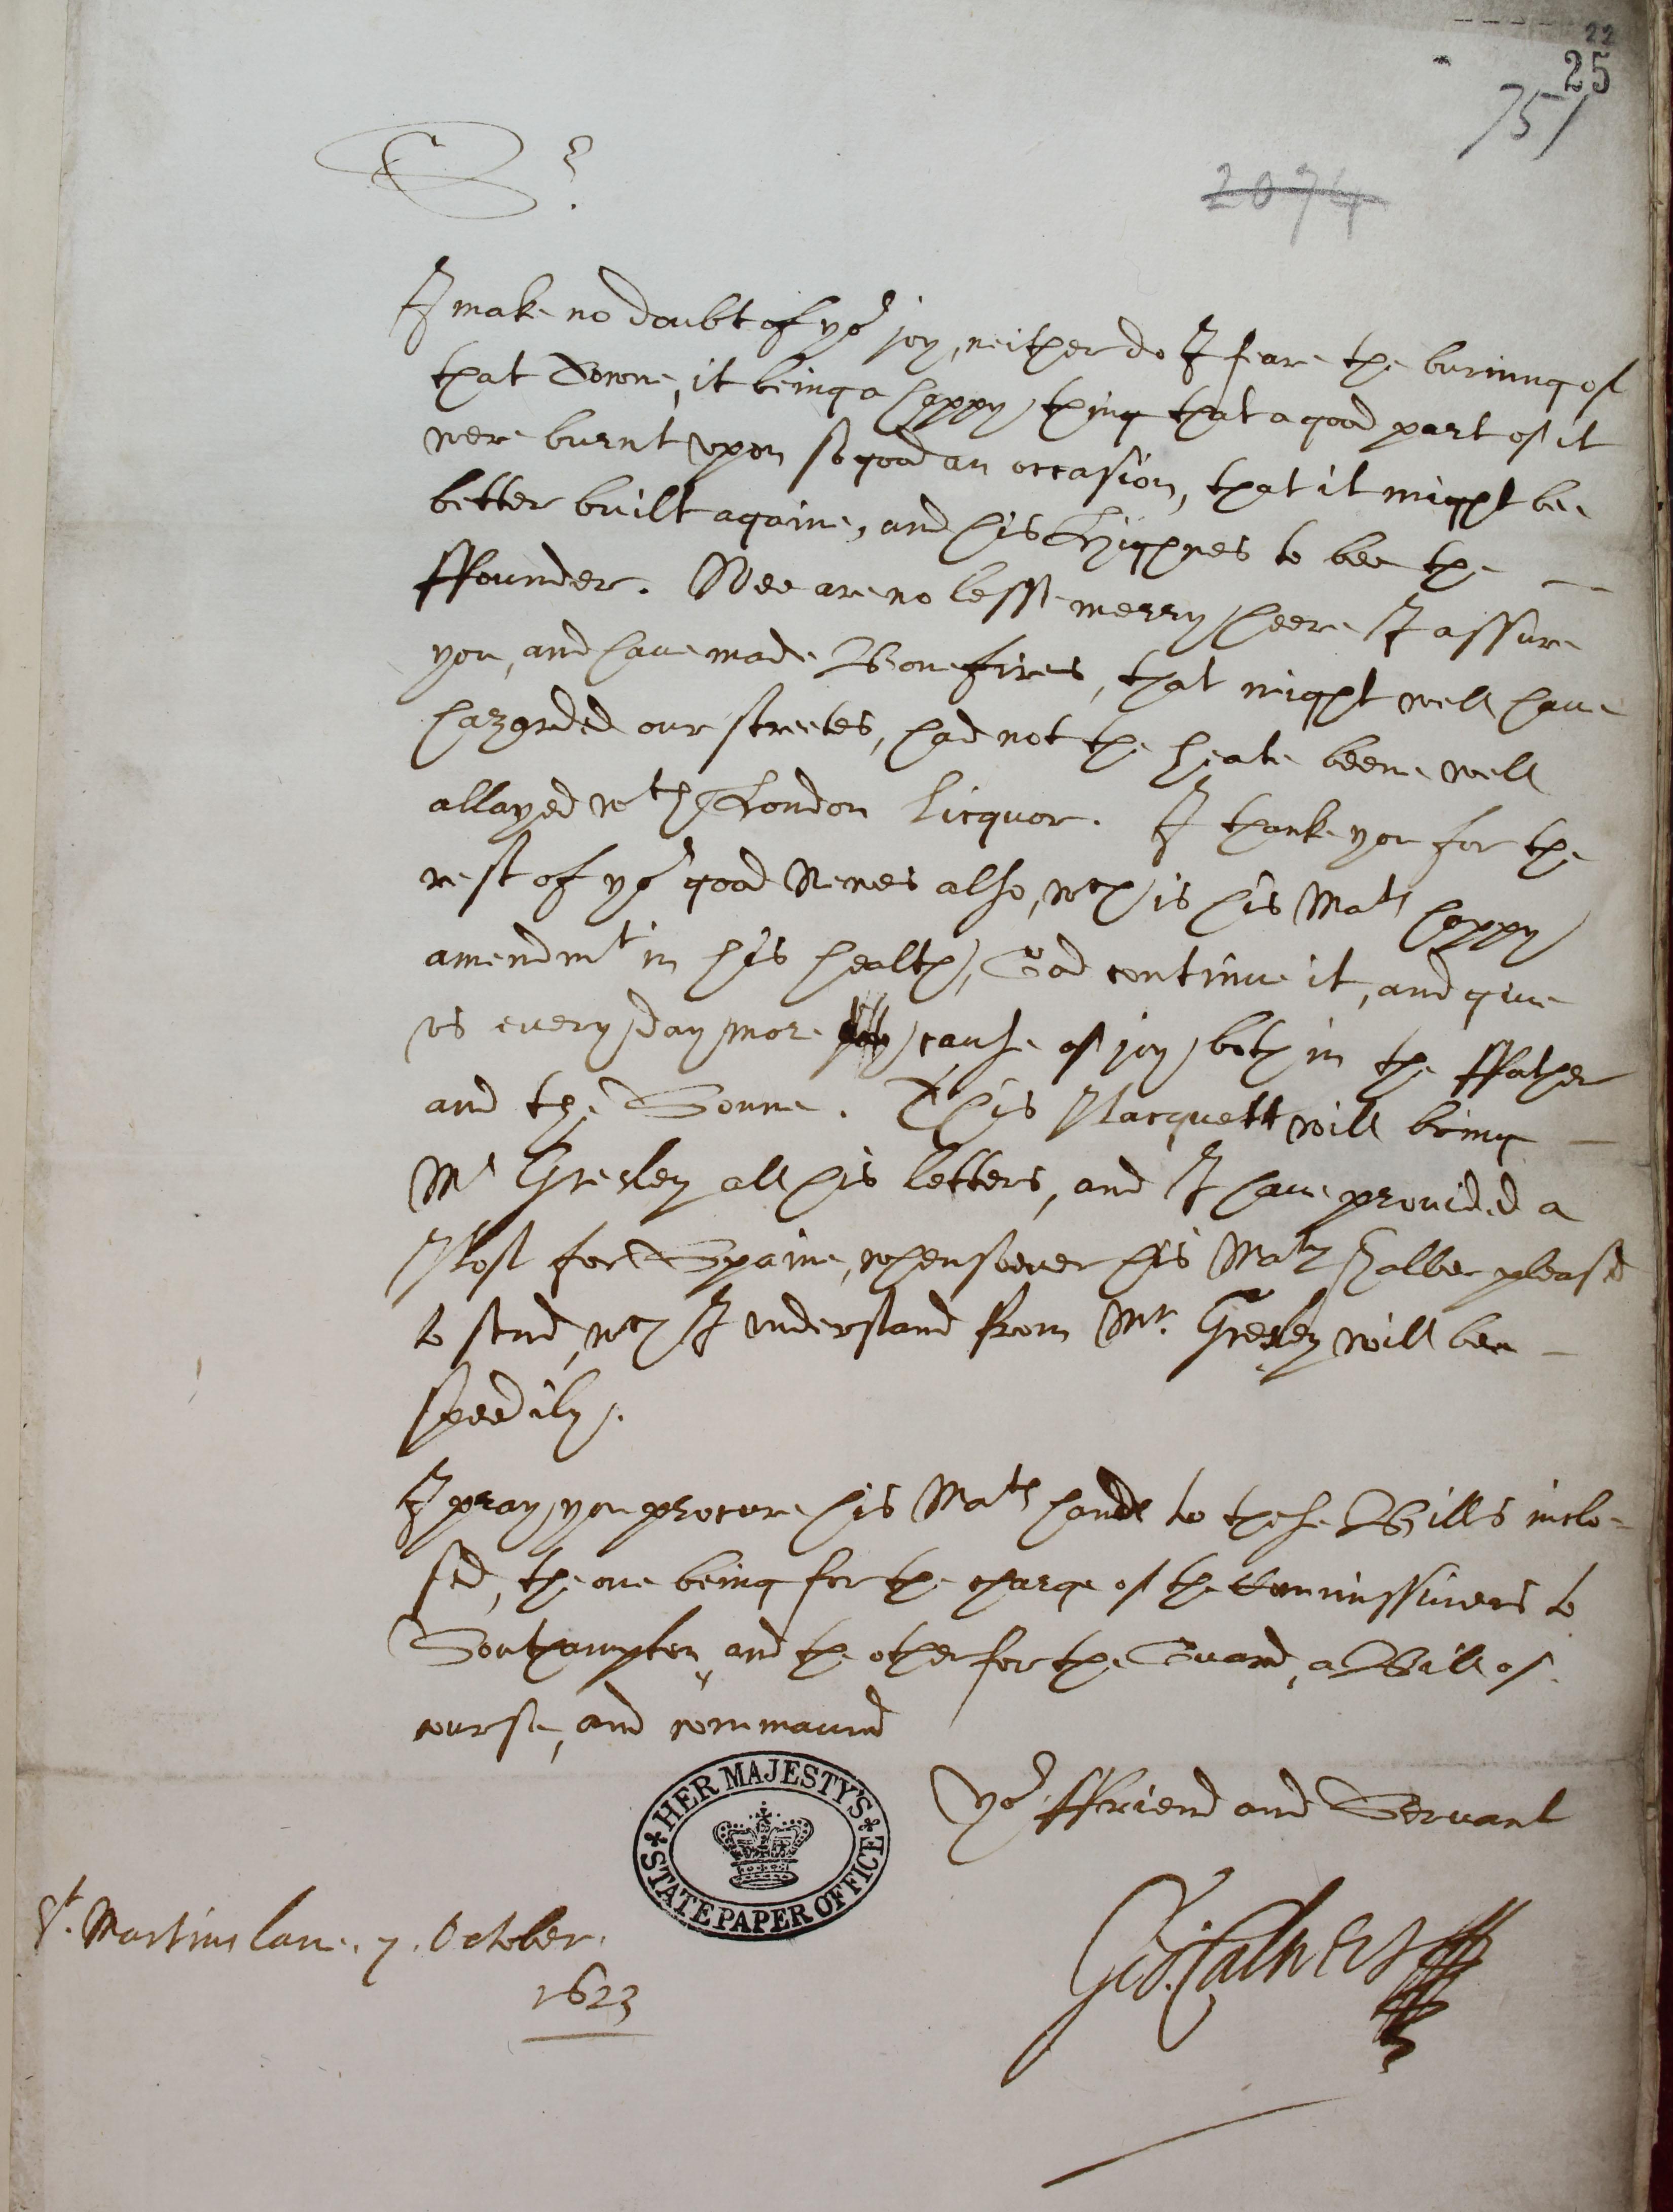 Prince Charles' return SP14/153 f.25